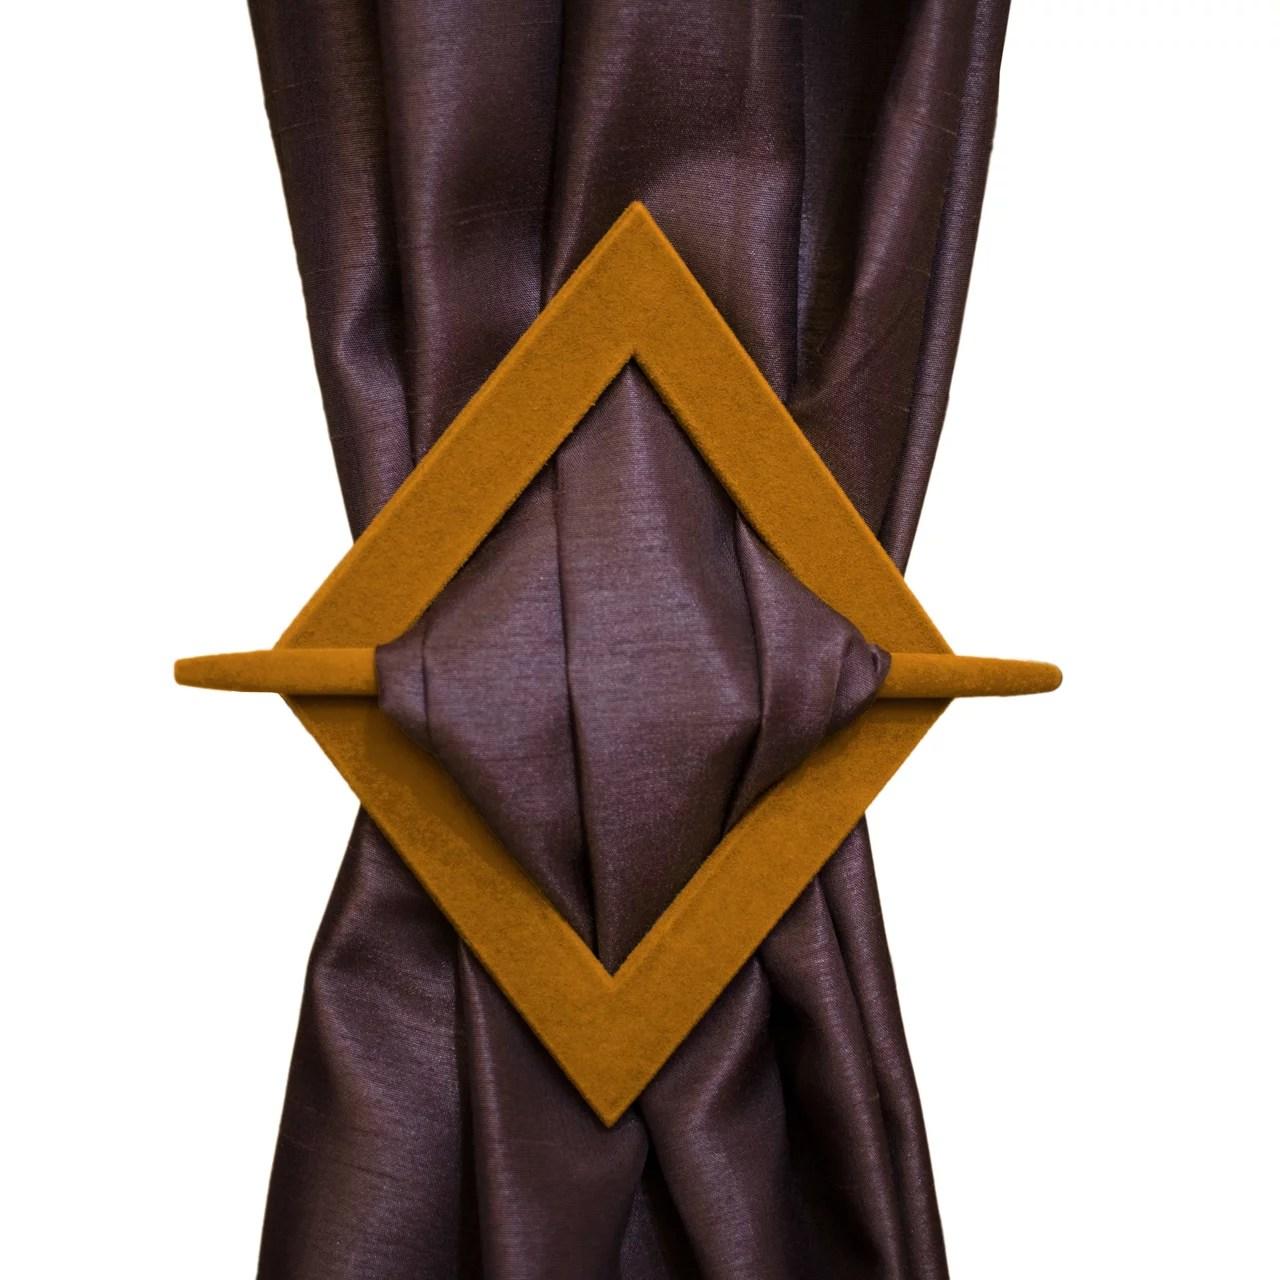 set of 2 luxurious diamond velvet flocked decorative curtain holdbacks tie backs gold